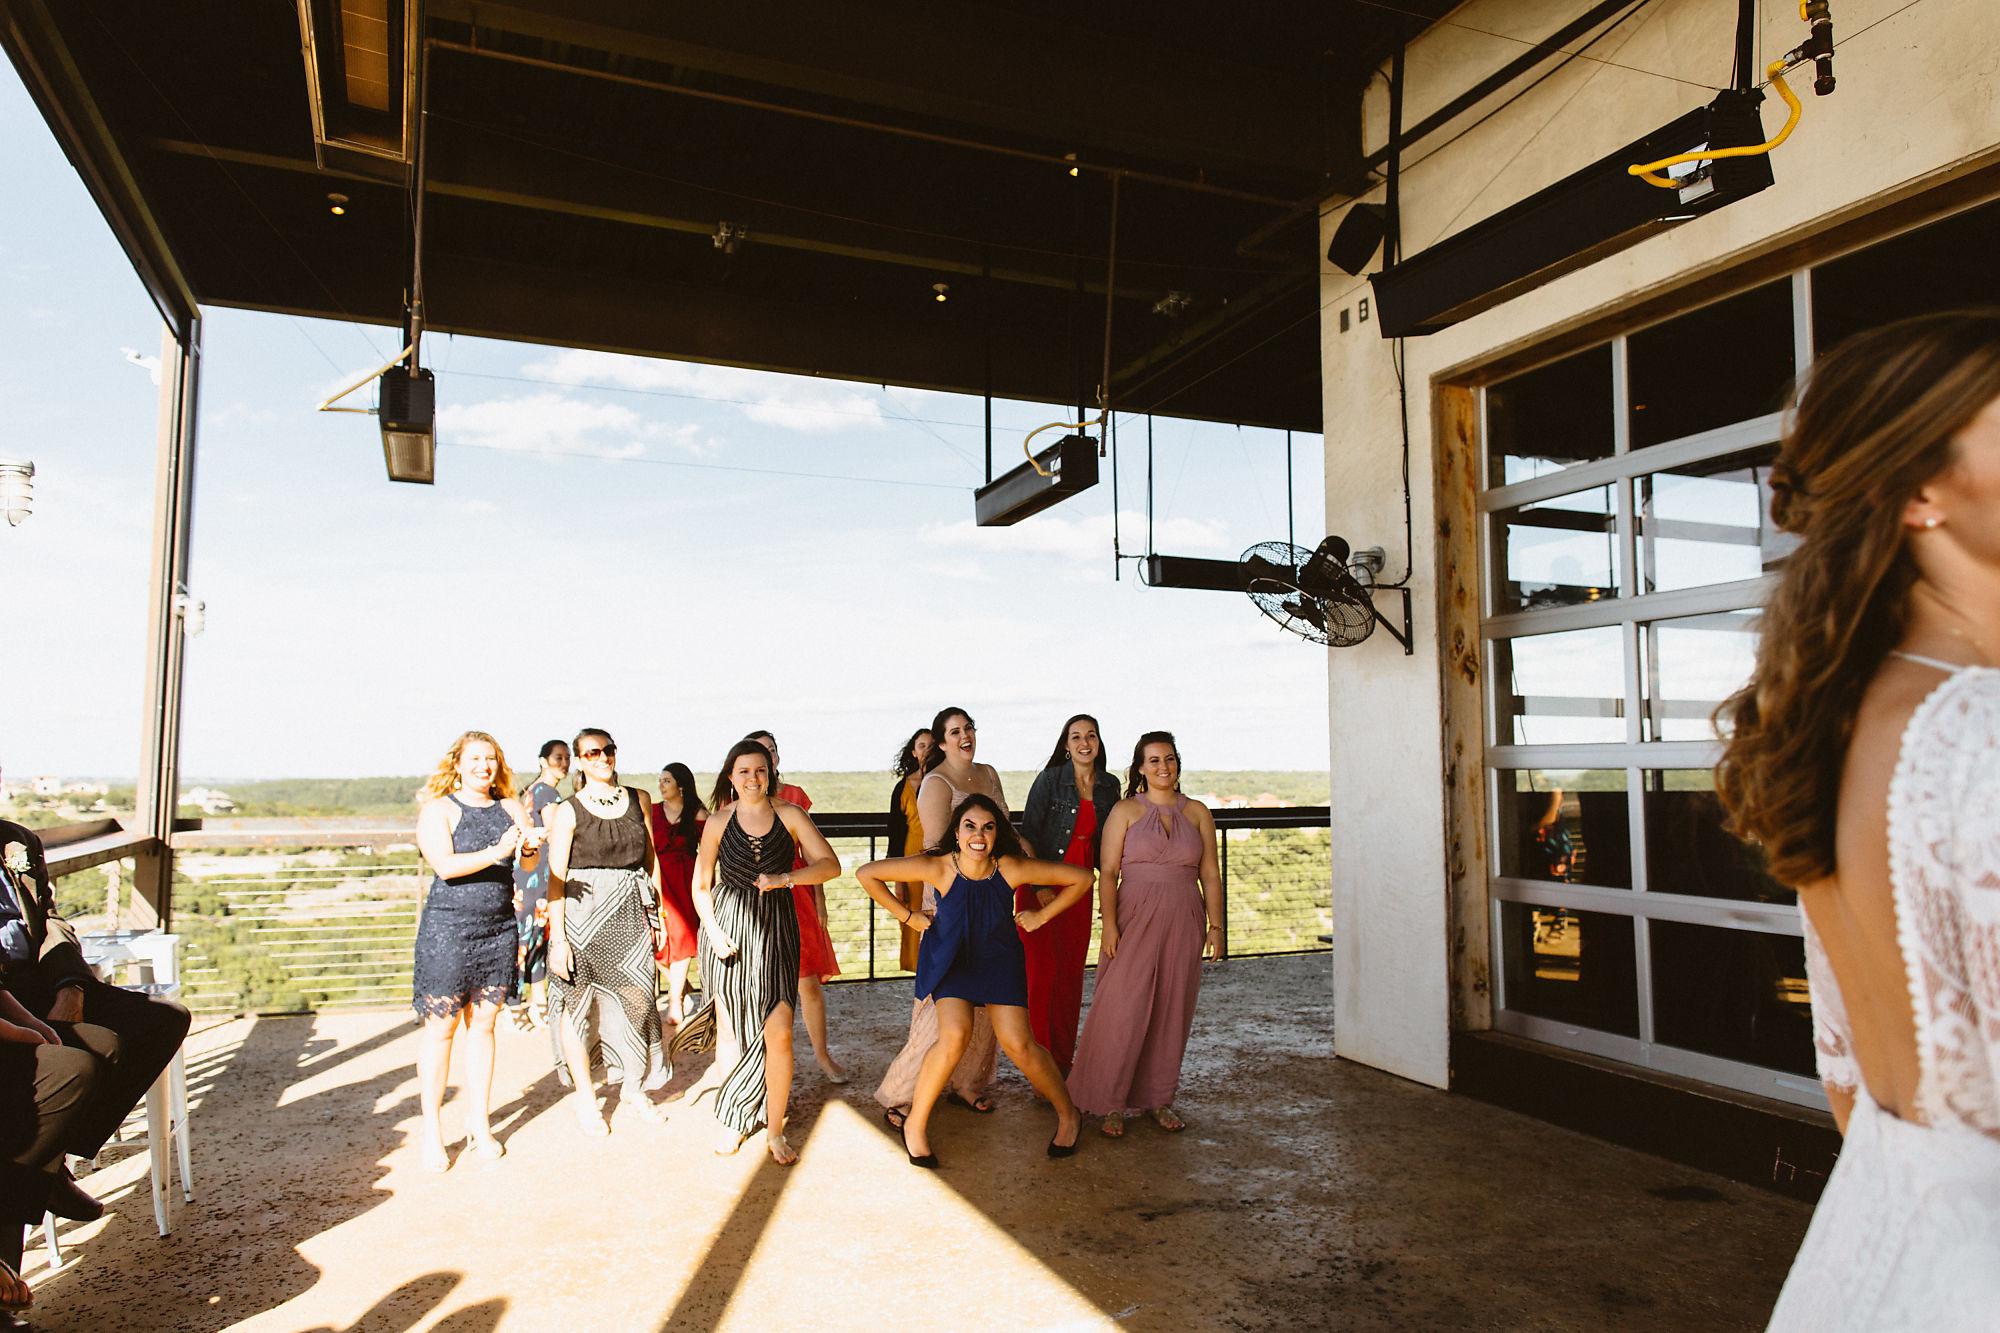 jessica_austin_oasis_brewery_wedding_photos162352.jpg